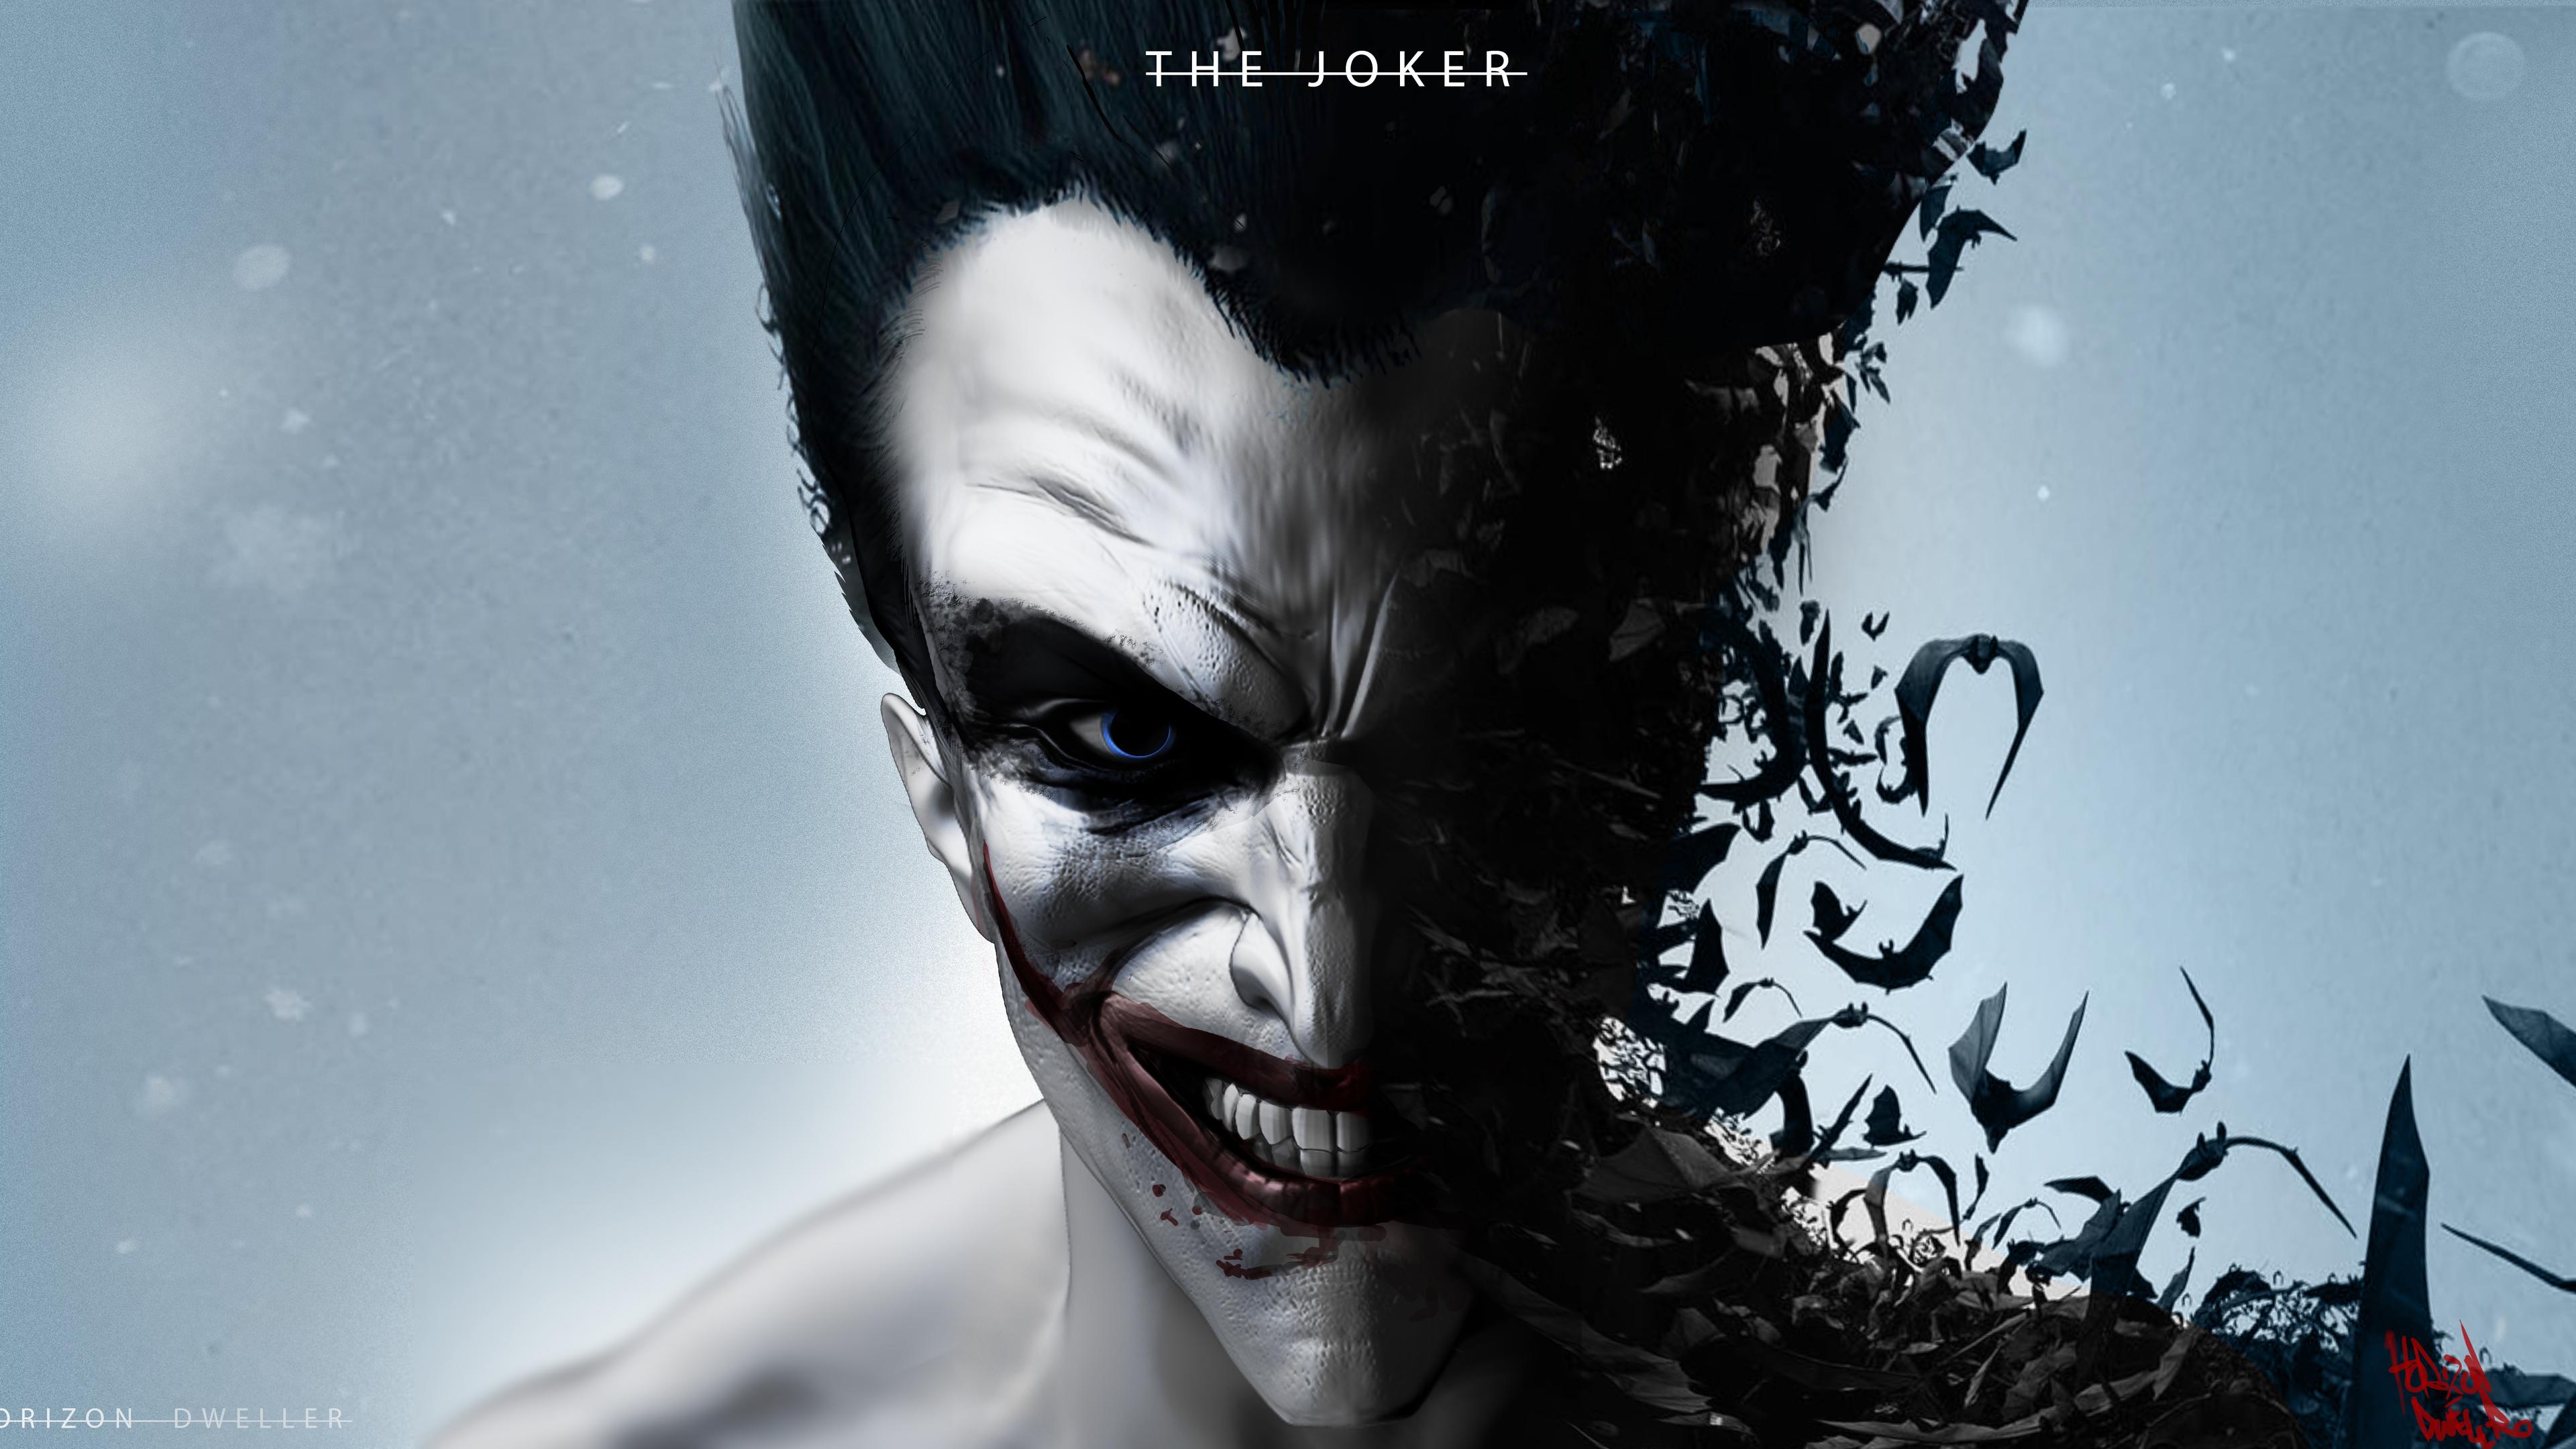 the joker 1536522545 - The Joker - supervillain wallpapers, superheroes wallpapers, joker wallpapers, hd-wallpapers, digital art wallpapers, deviantart wallpapers, artwork wallpapers, artist wallpapers, 5k wallpapers, 4k-wallpapers